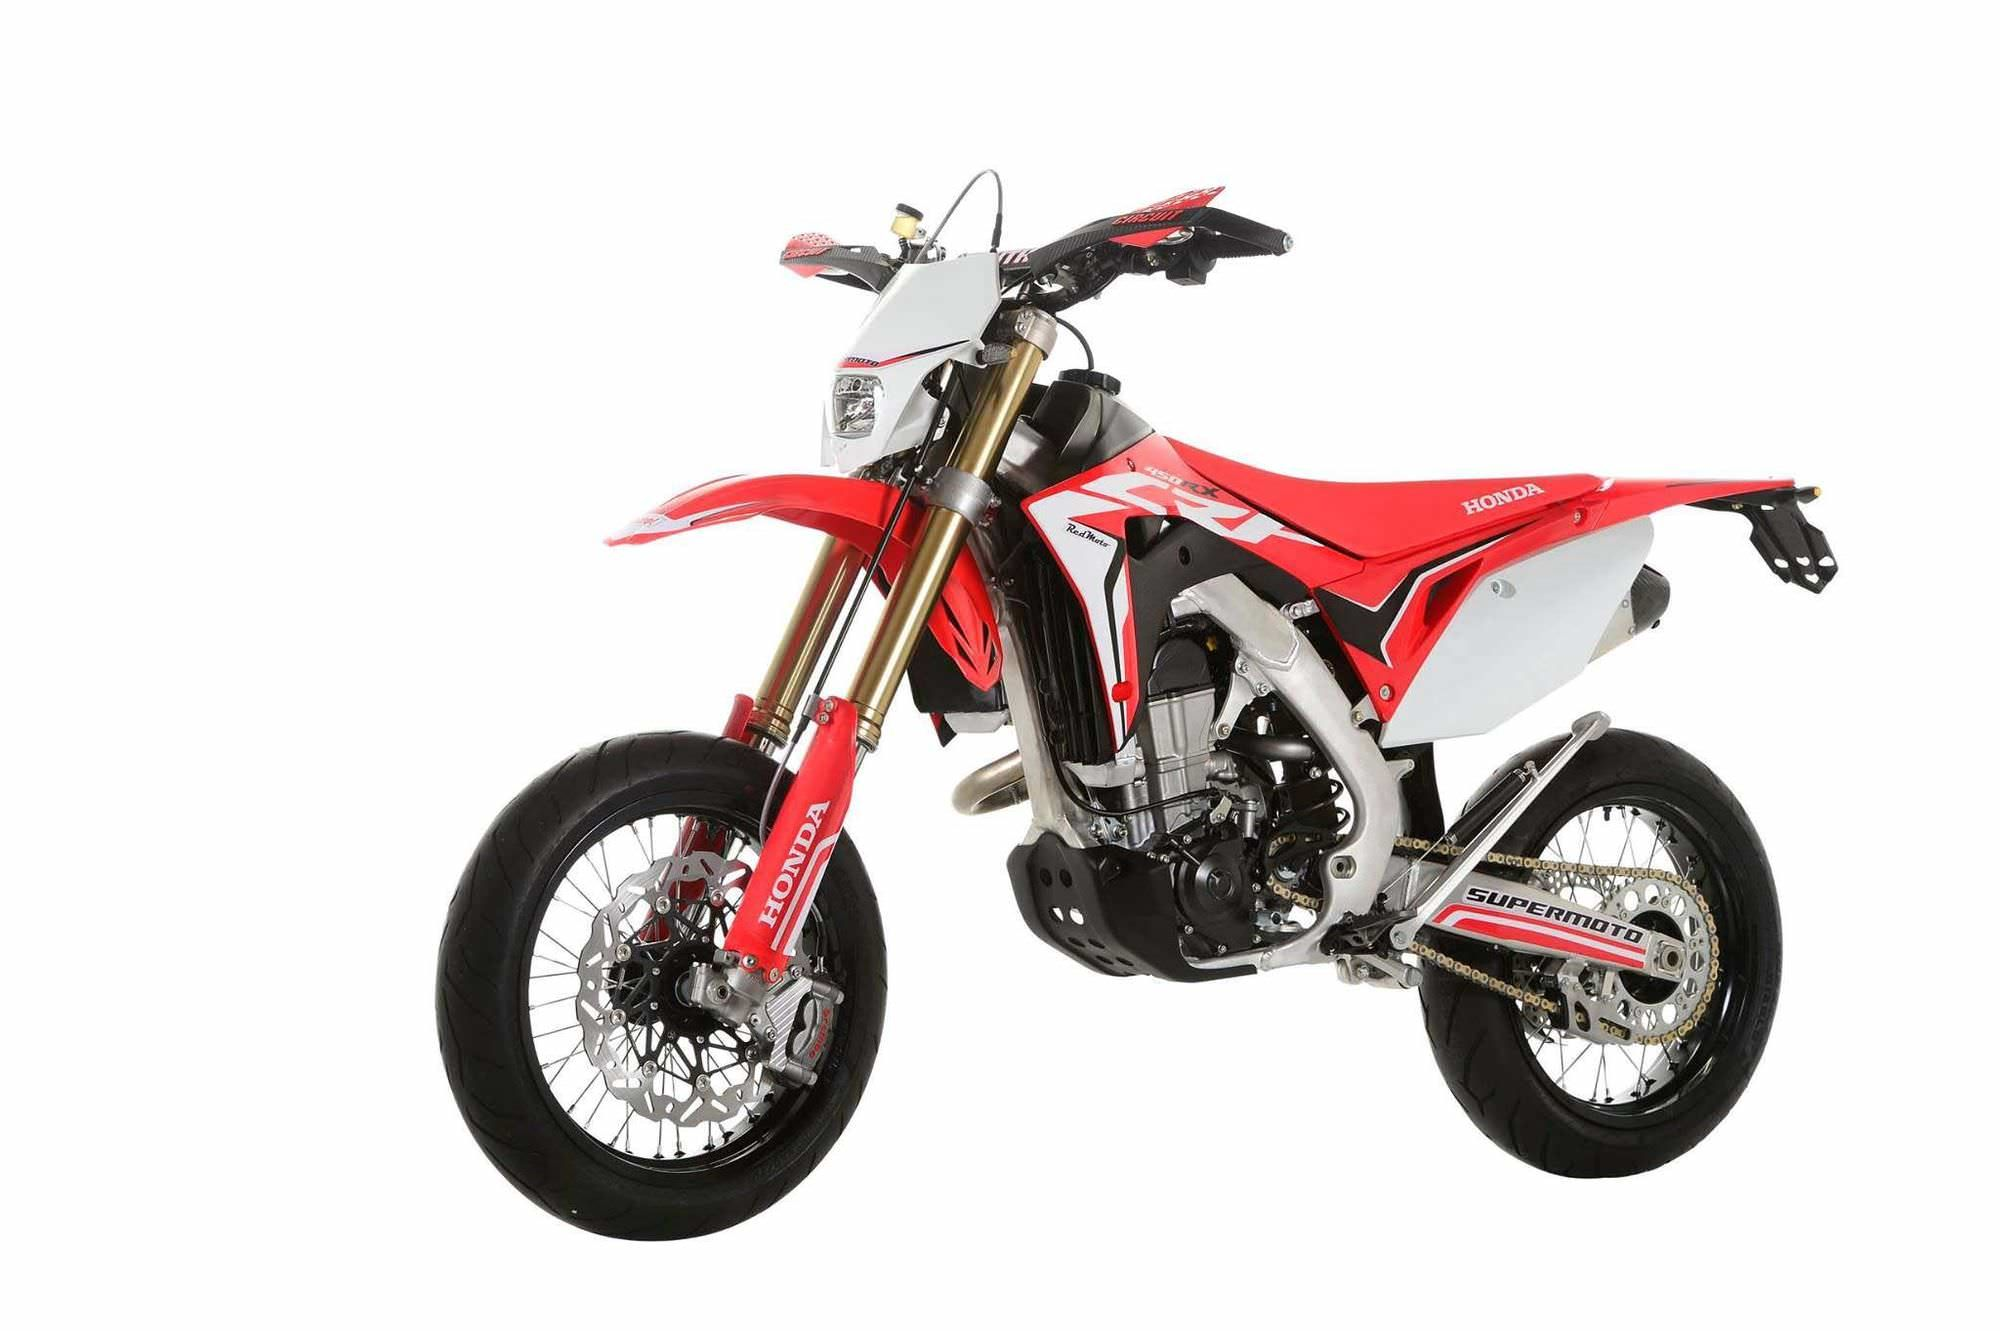 StreetLegal 2017 Honda CRF450R SuperMoto Bike that YOU